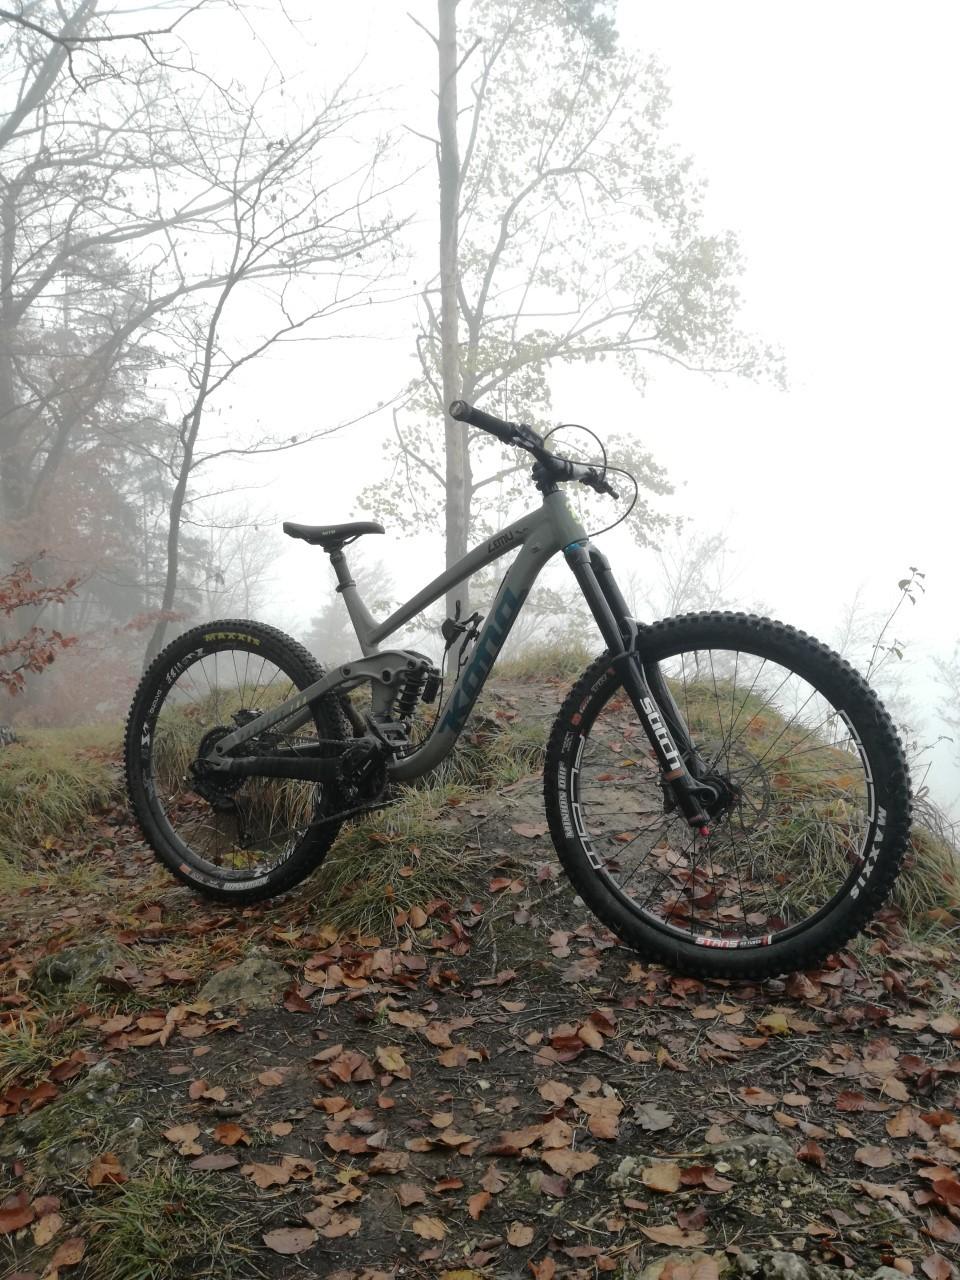 Kona Process 165 - LuxBikeTV - Mountain Biking Pictures - Vital MTB